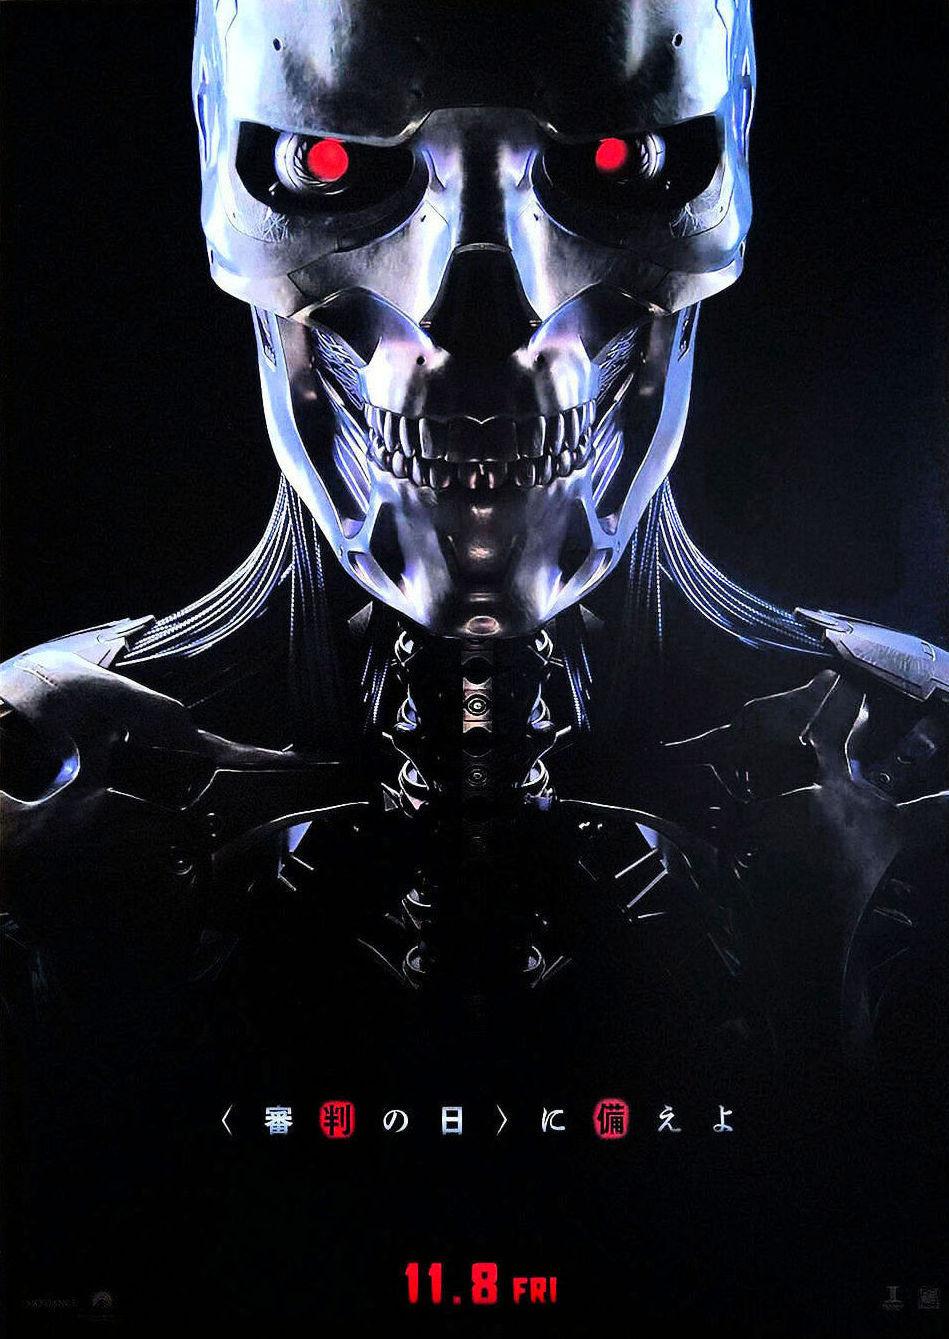 Póster japonés de Terminator: Dark Fate (2019). Imagen: impawards.com